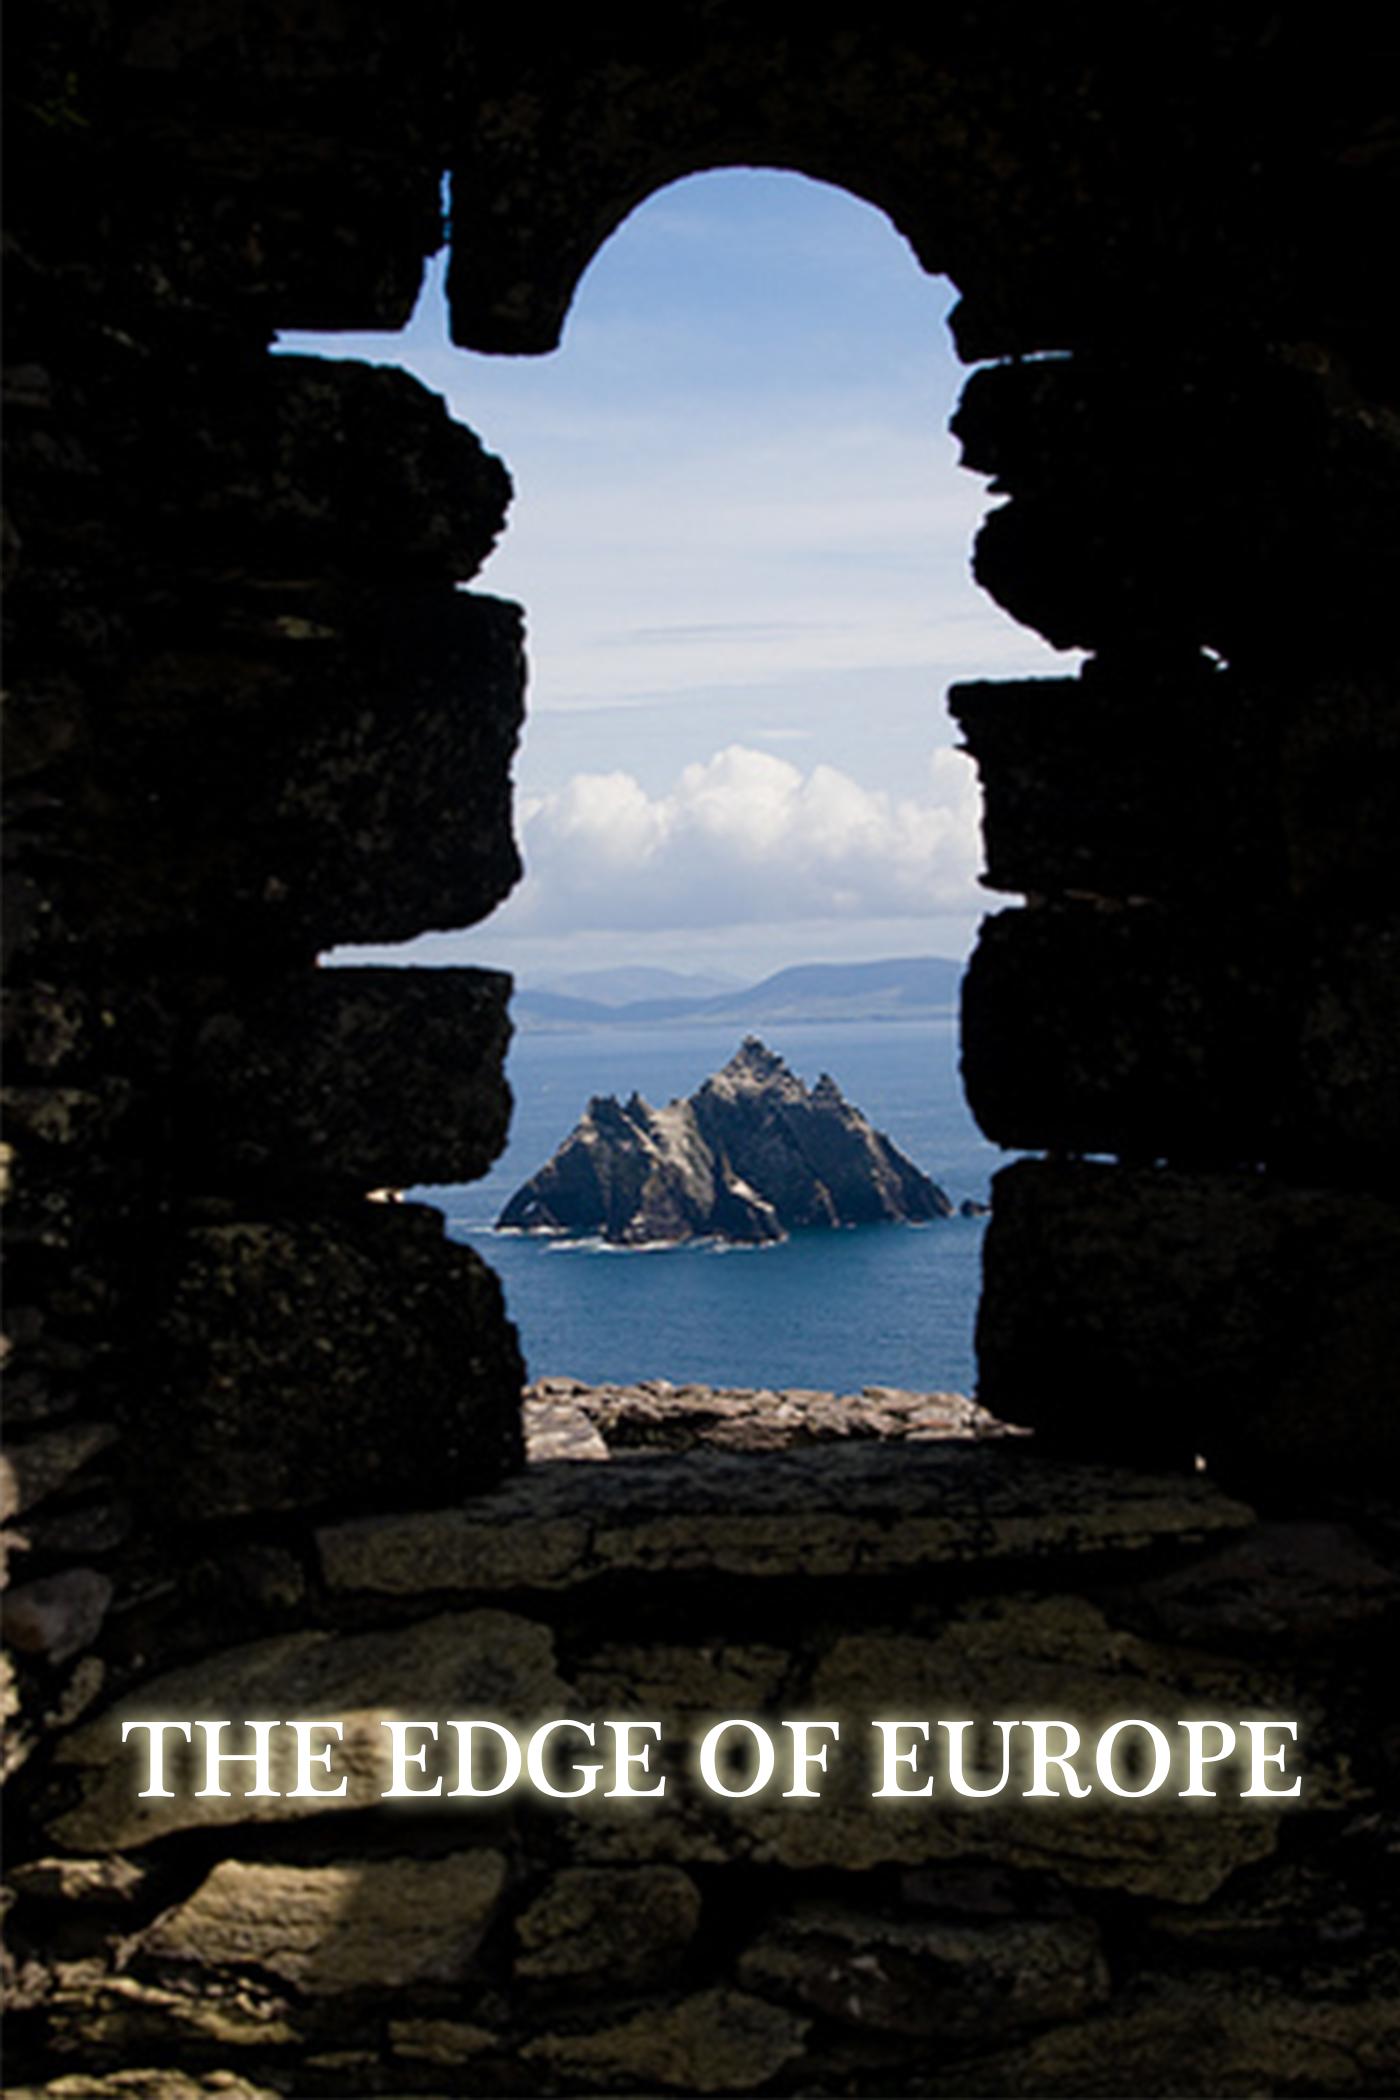 The Edge of Europe